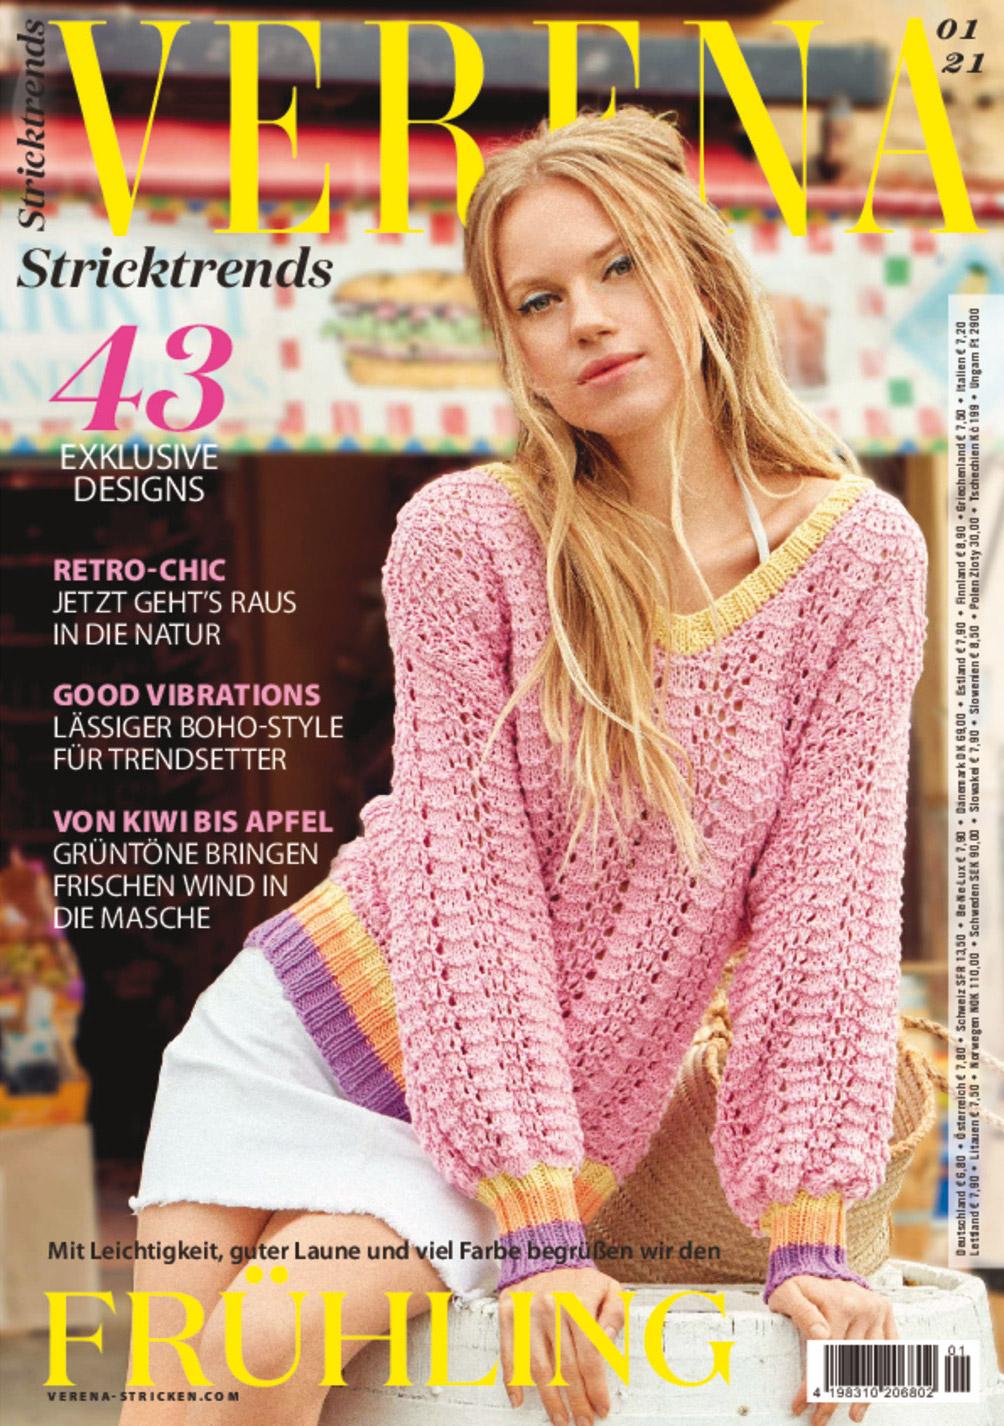 Verena Stricktrends 01/2021 - Wir begrüßen den Frühling!